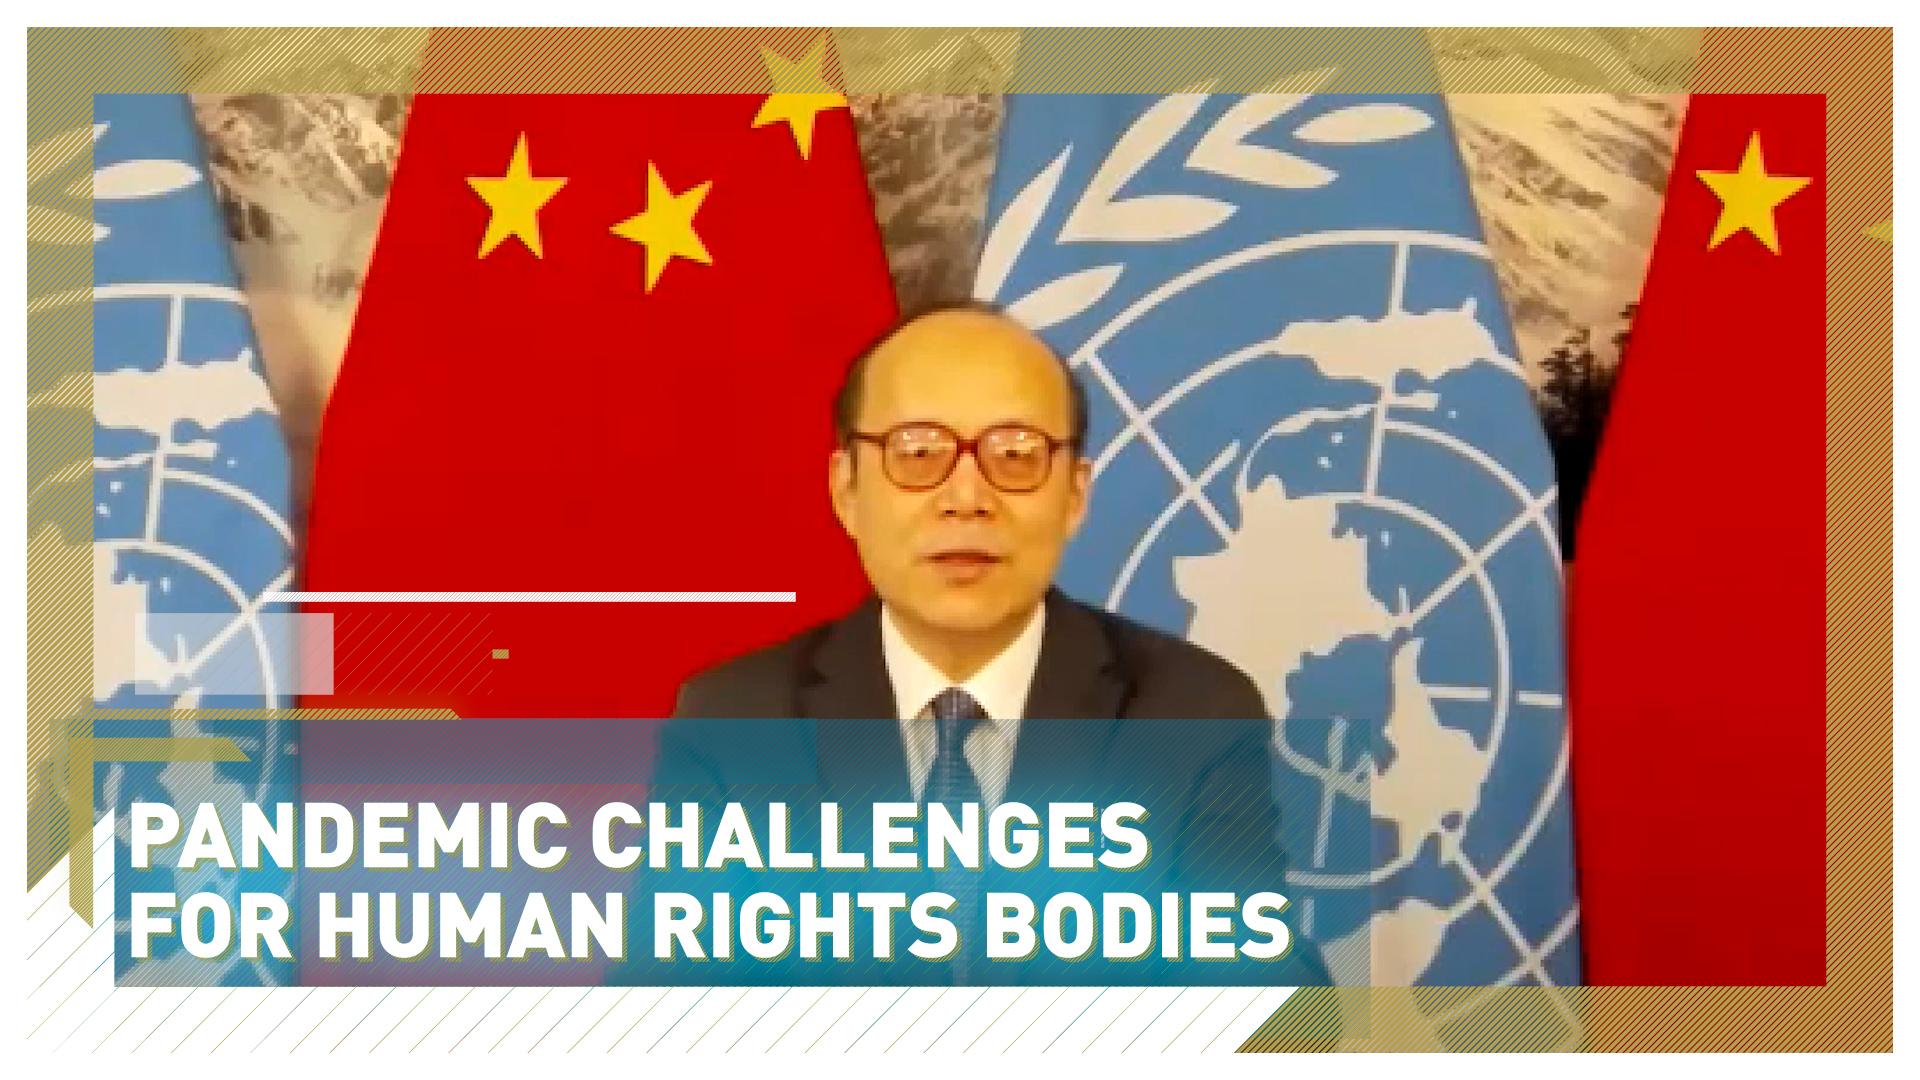 China's UN envoy Chen Xu warns of pandemic impact on human rights